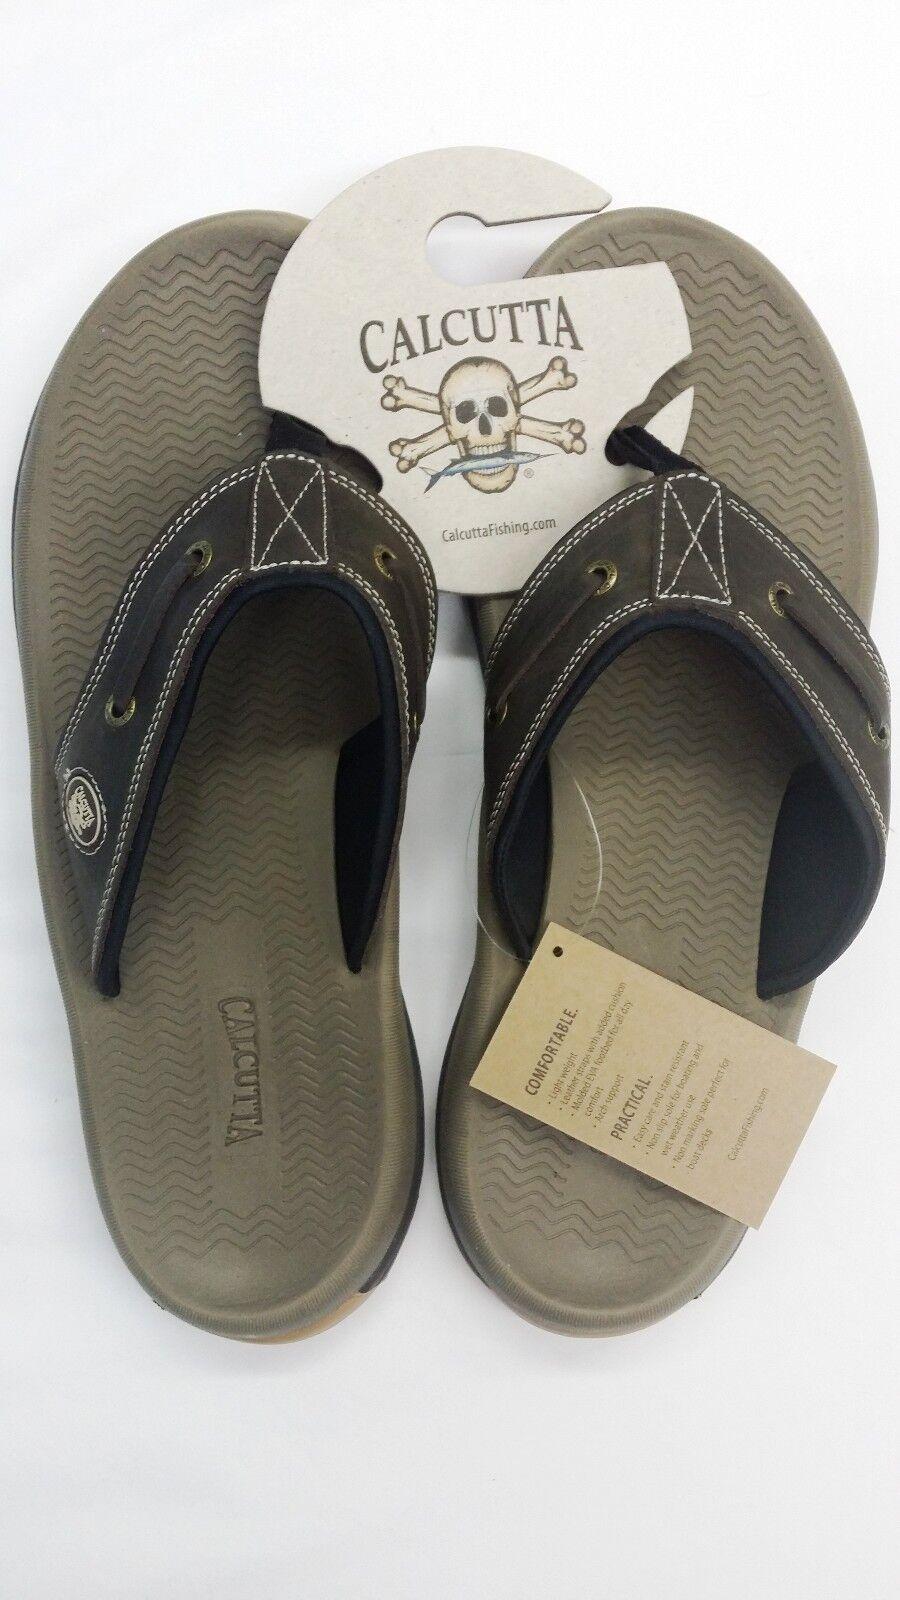 Calcutta Fishing blueeWater Sandal, Non Slip, Leather Straps, Tan Brown Mens